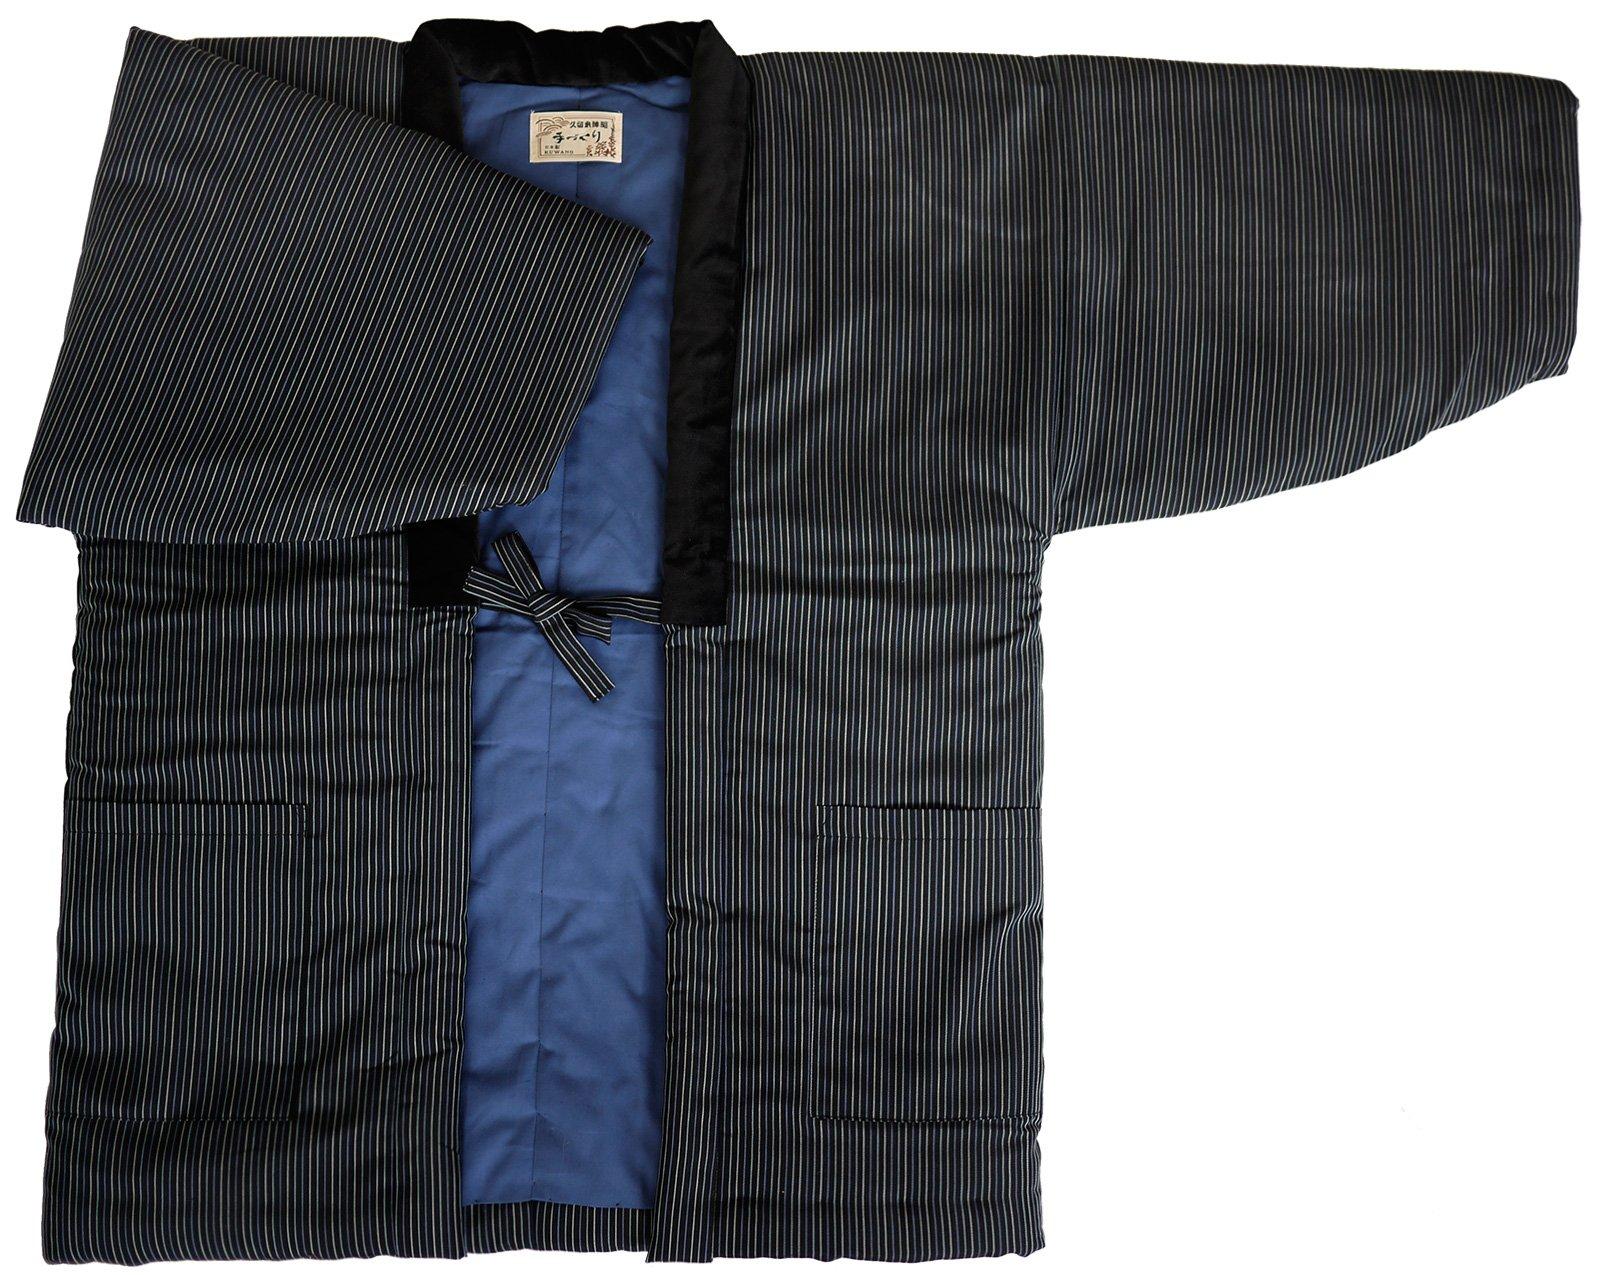 HANTEN (Cotton jacket made in Japan Kimono-style) ImportJapanese clothes size Men's (Medium, 76) by WATANOSATO